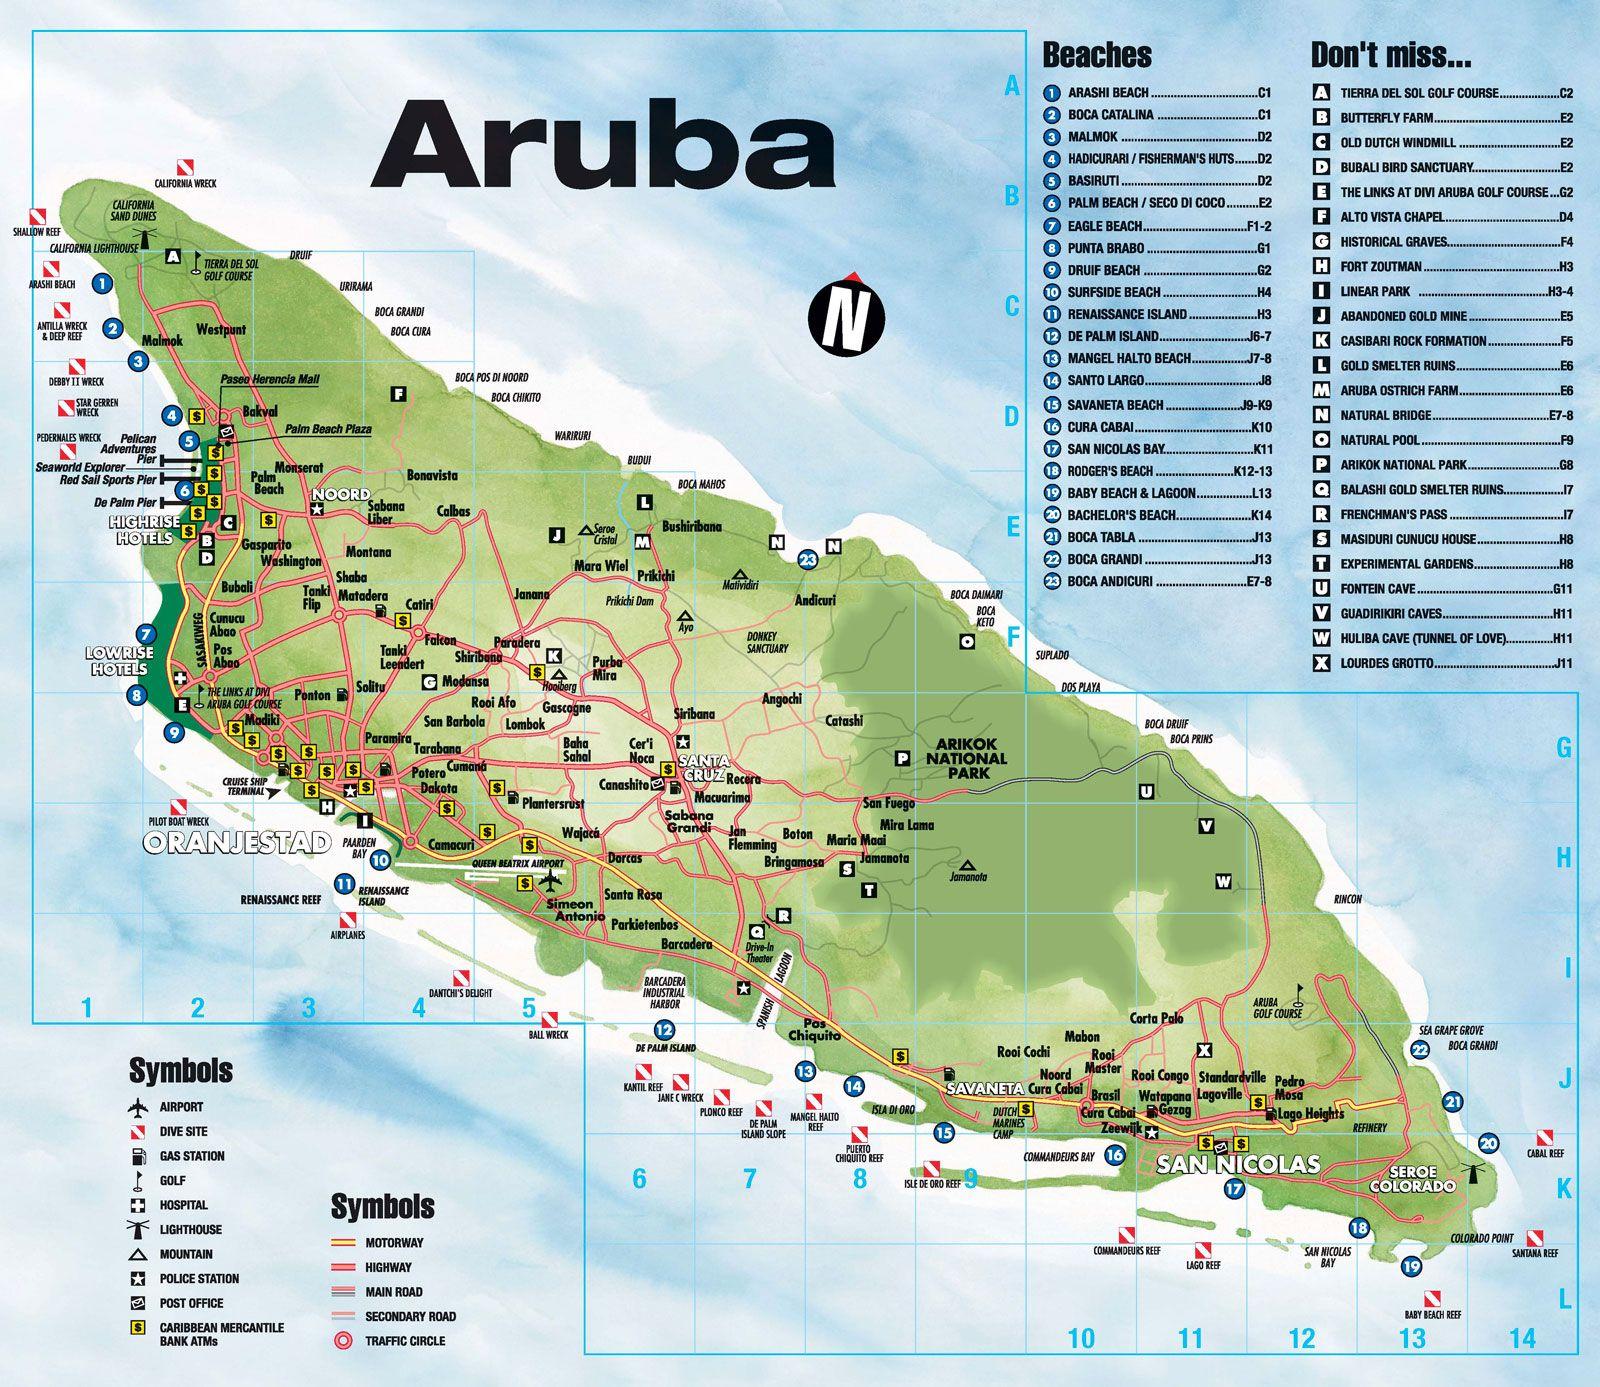 Solomon Islands Beach: Fat-friendly Beach Destinations -- Aruba, Jamaica, Kauai